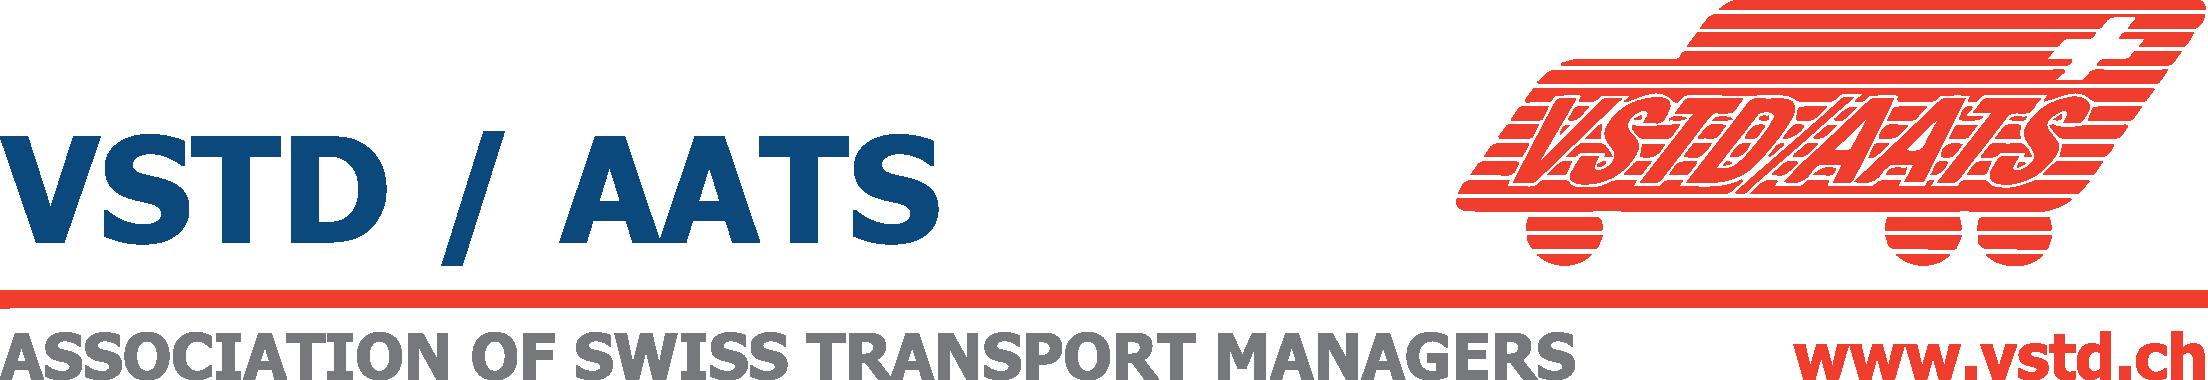 logo VSTD